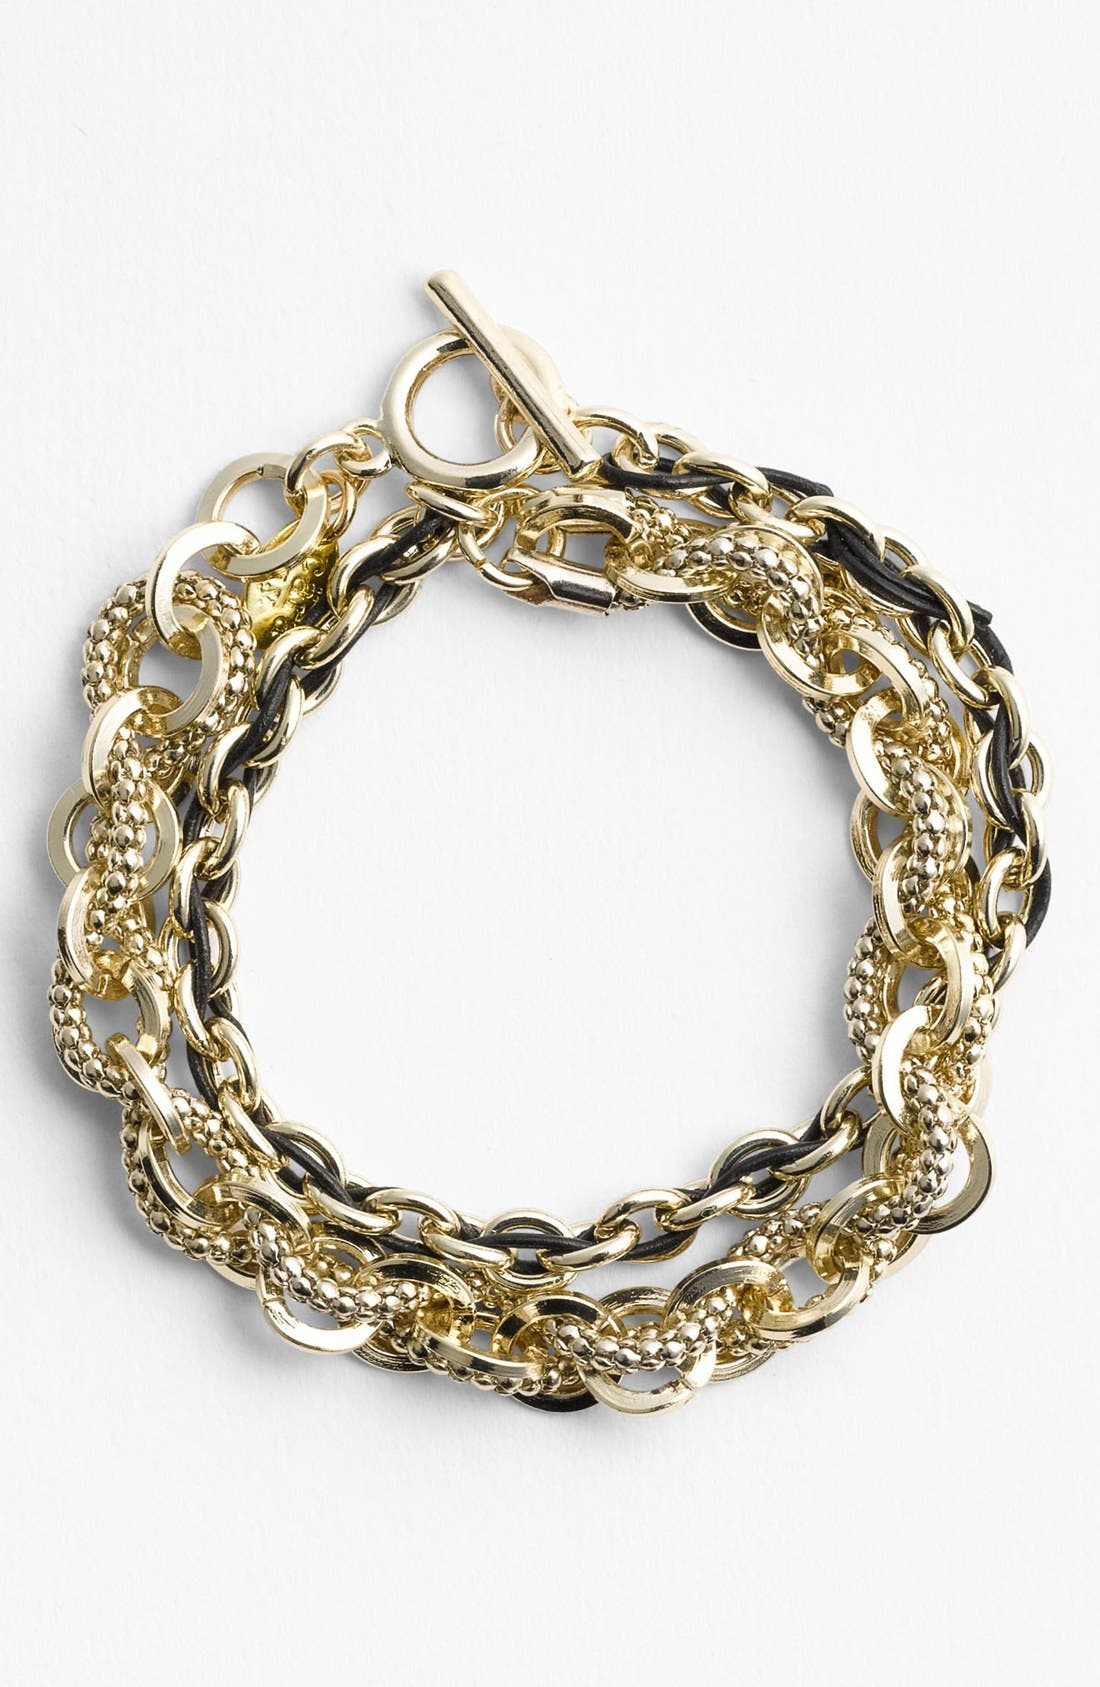 Main Image - Cara Link & Leather Double Wrap Bracelet